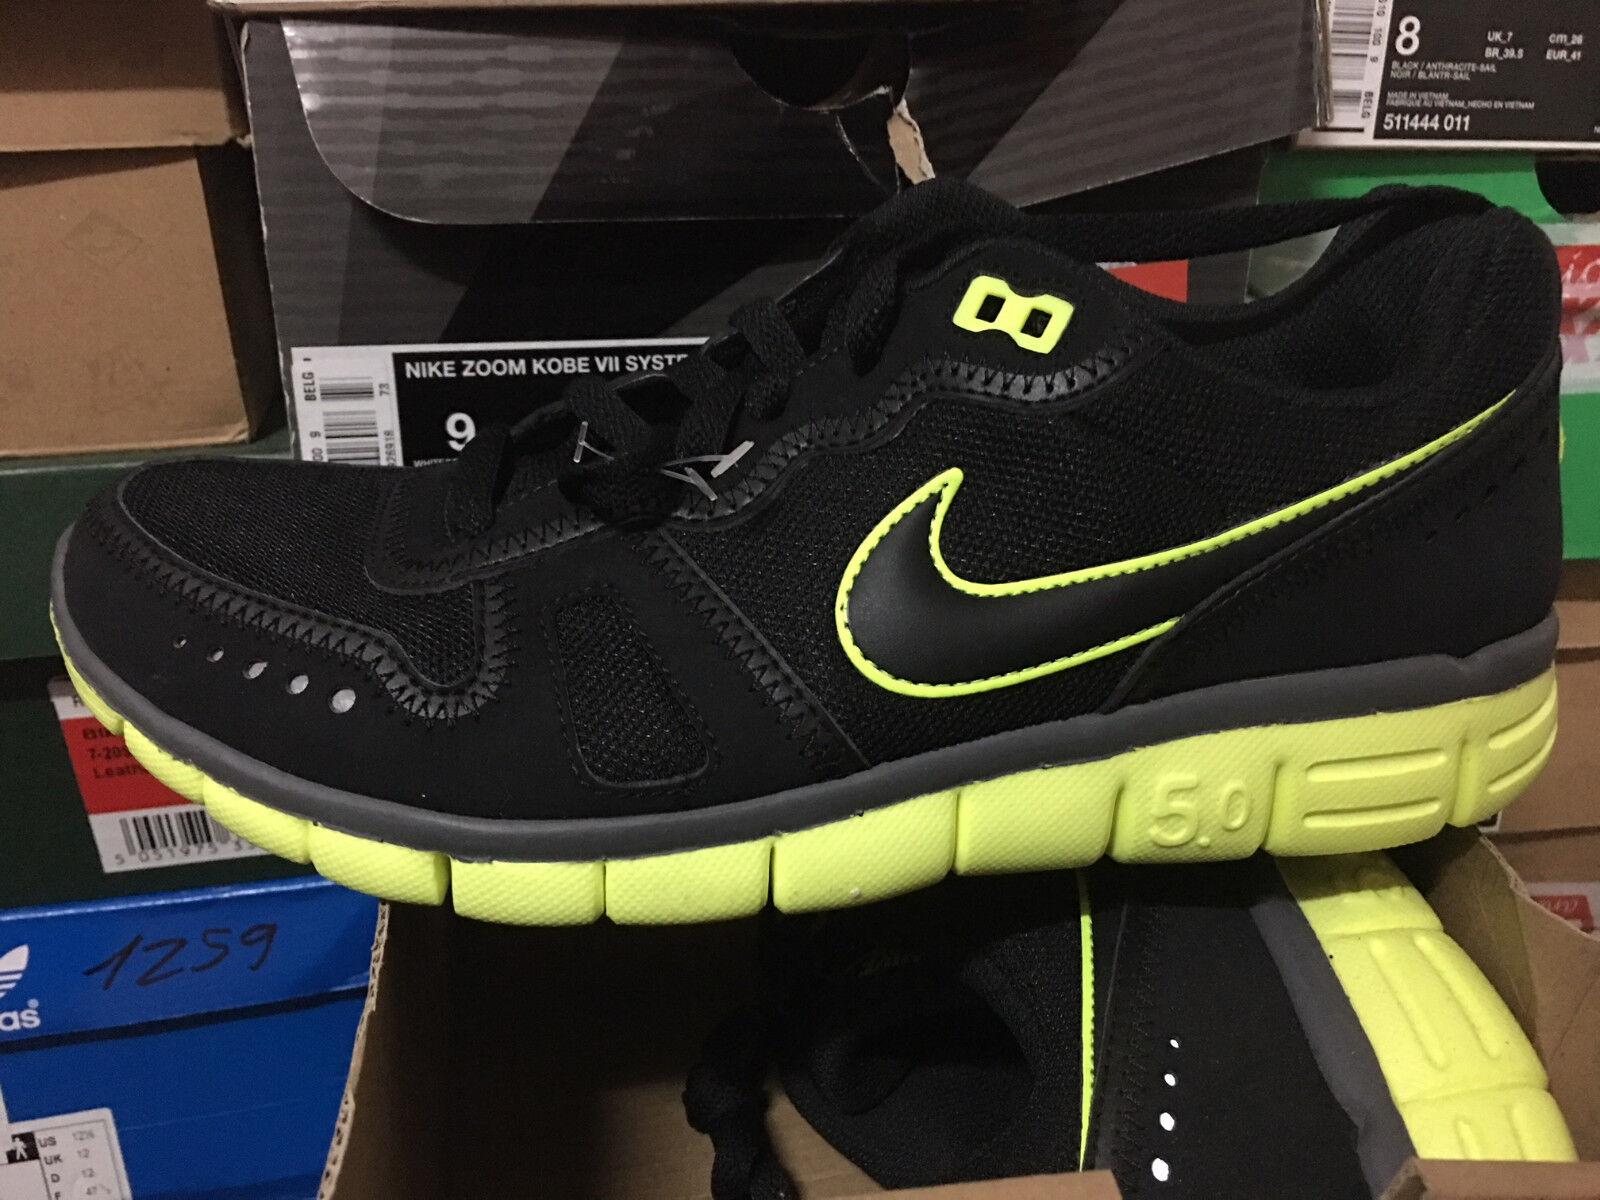 Nike Free Waffle AC Neu Snekaer Free Moire Presto Black_yellow Gr:41 US:8